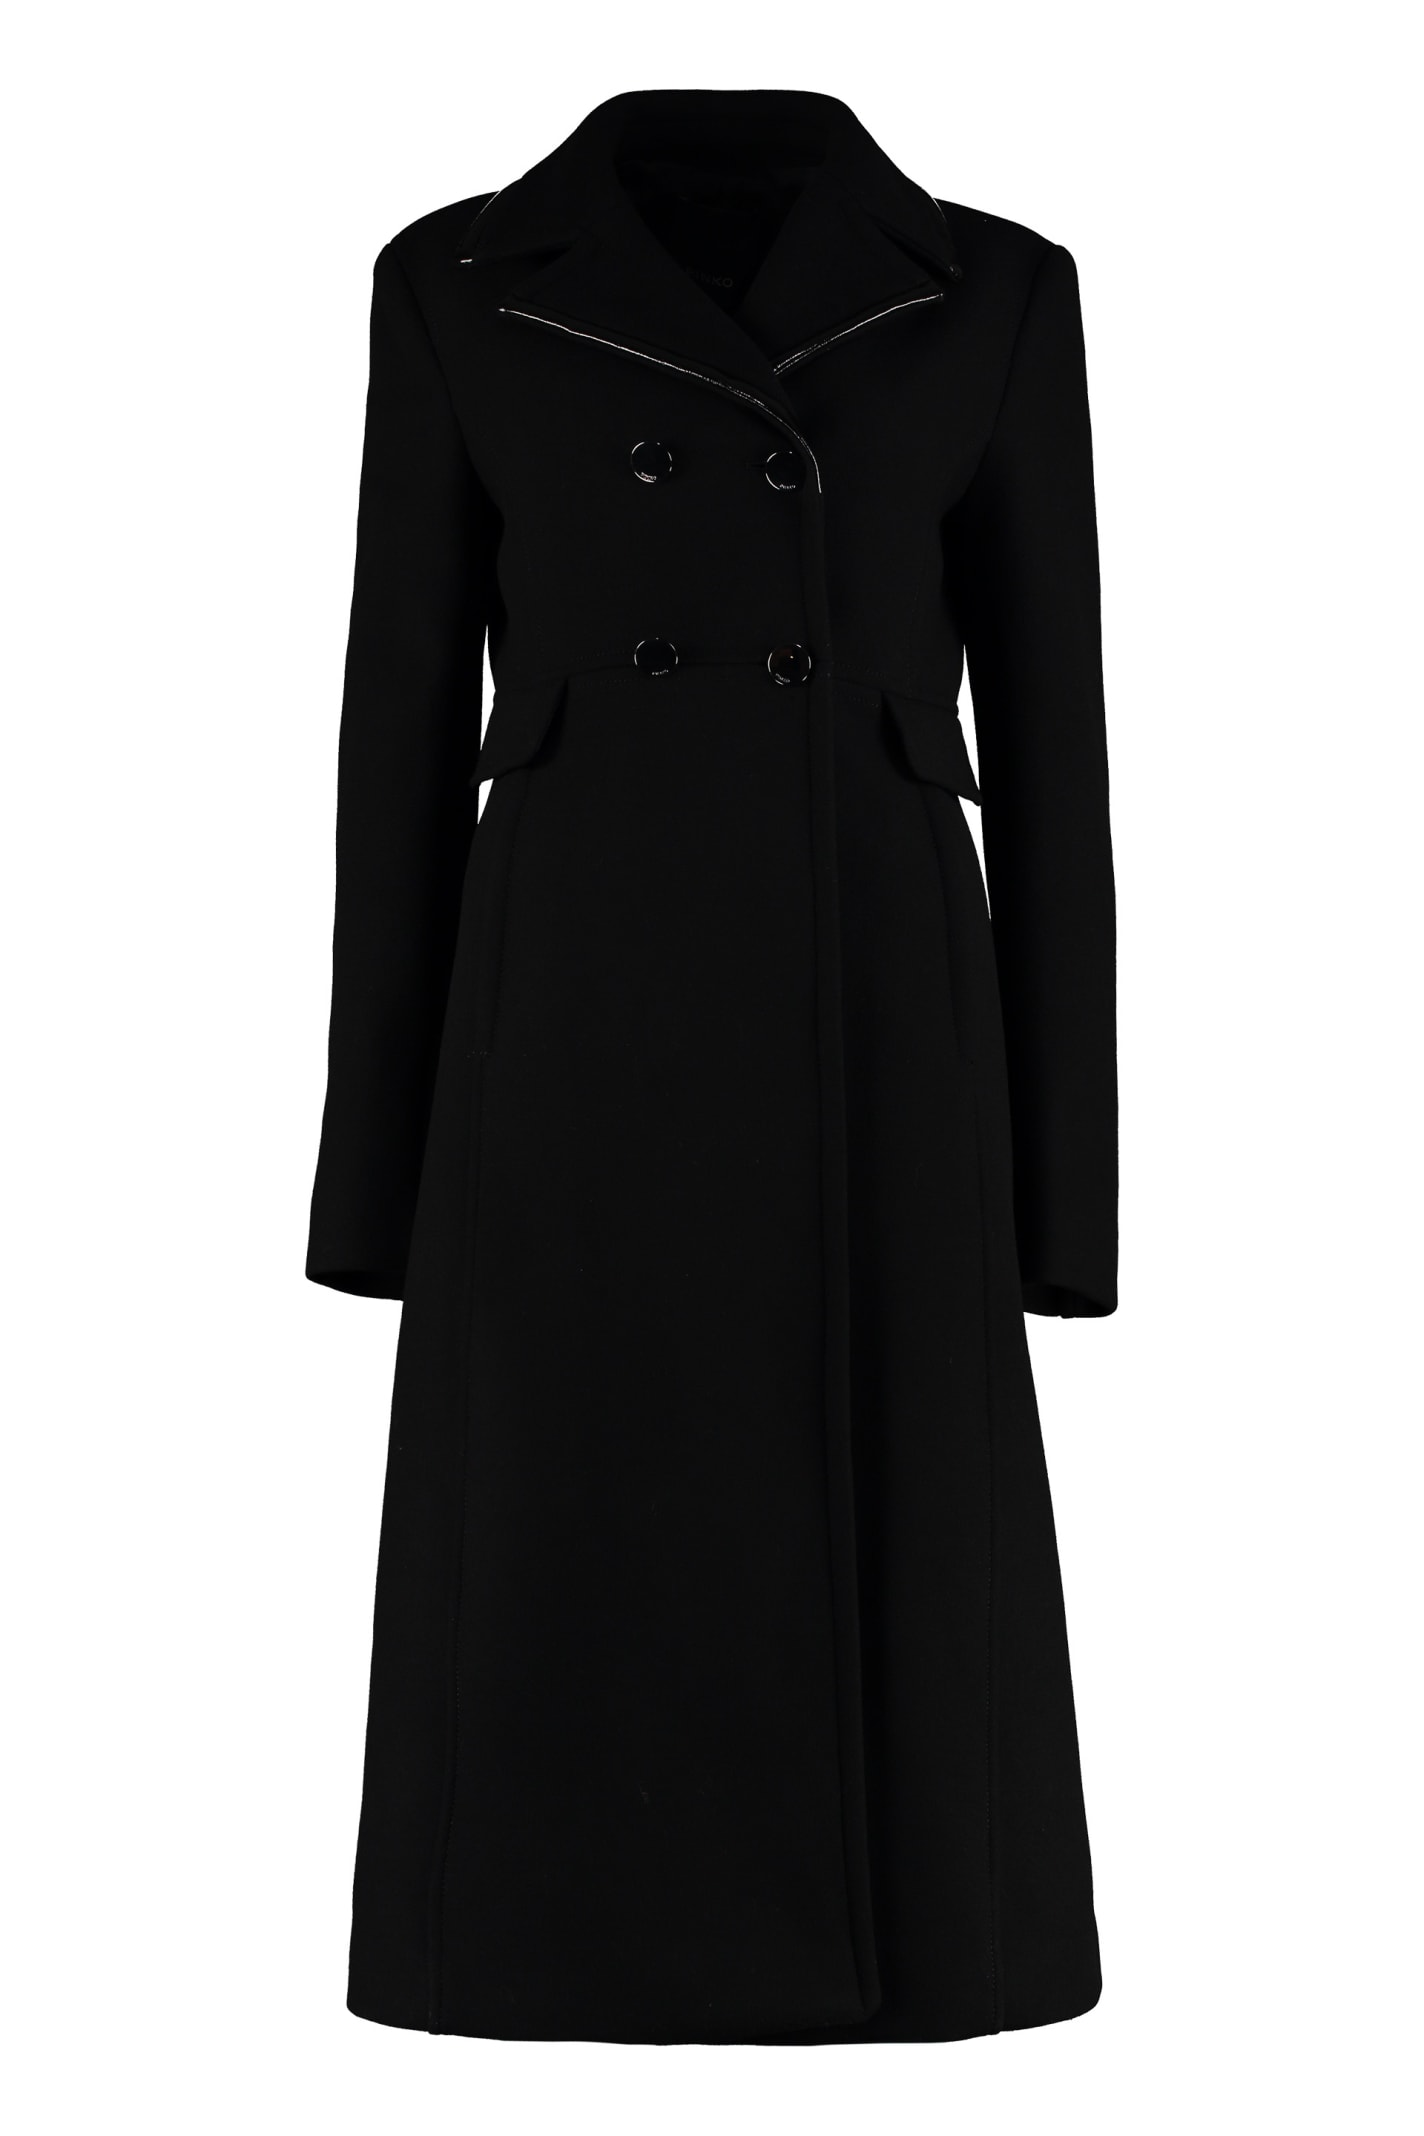 Pinko Preporre Long Wool Cloth Coat